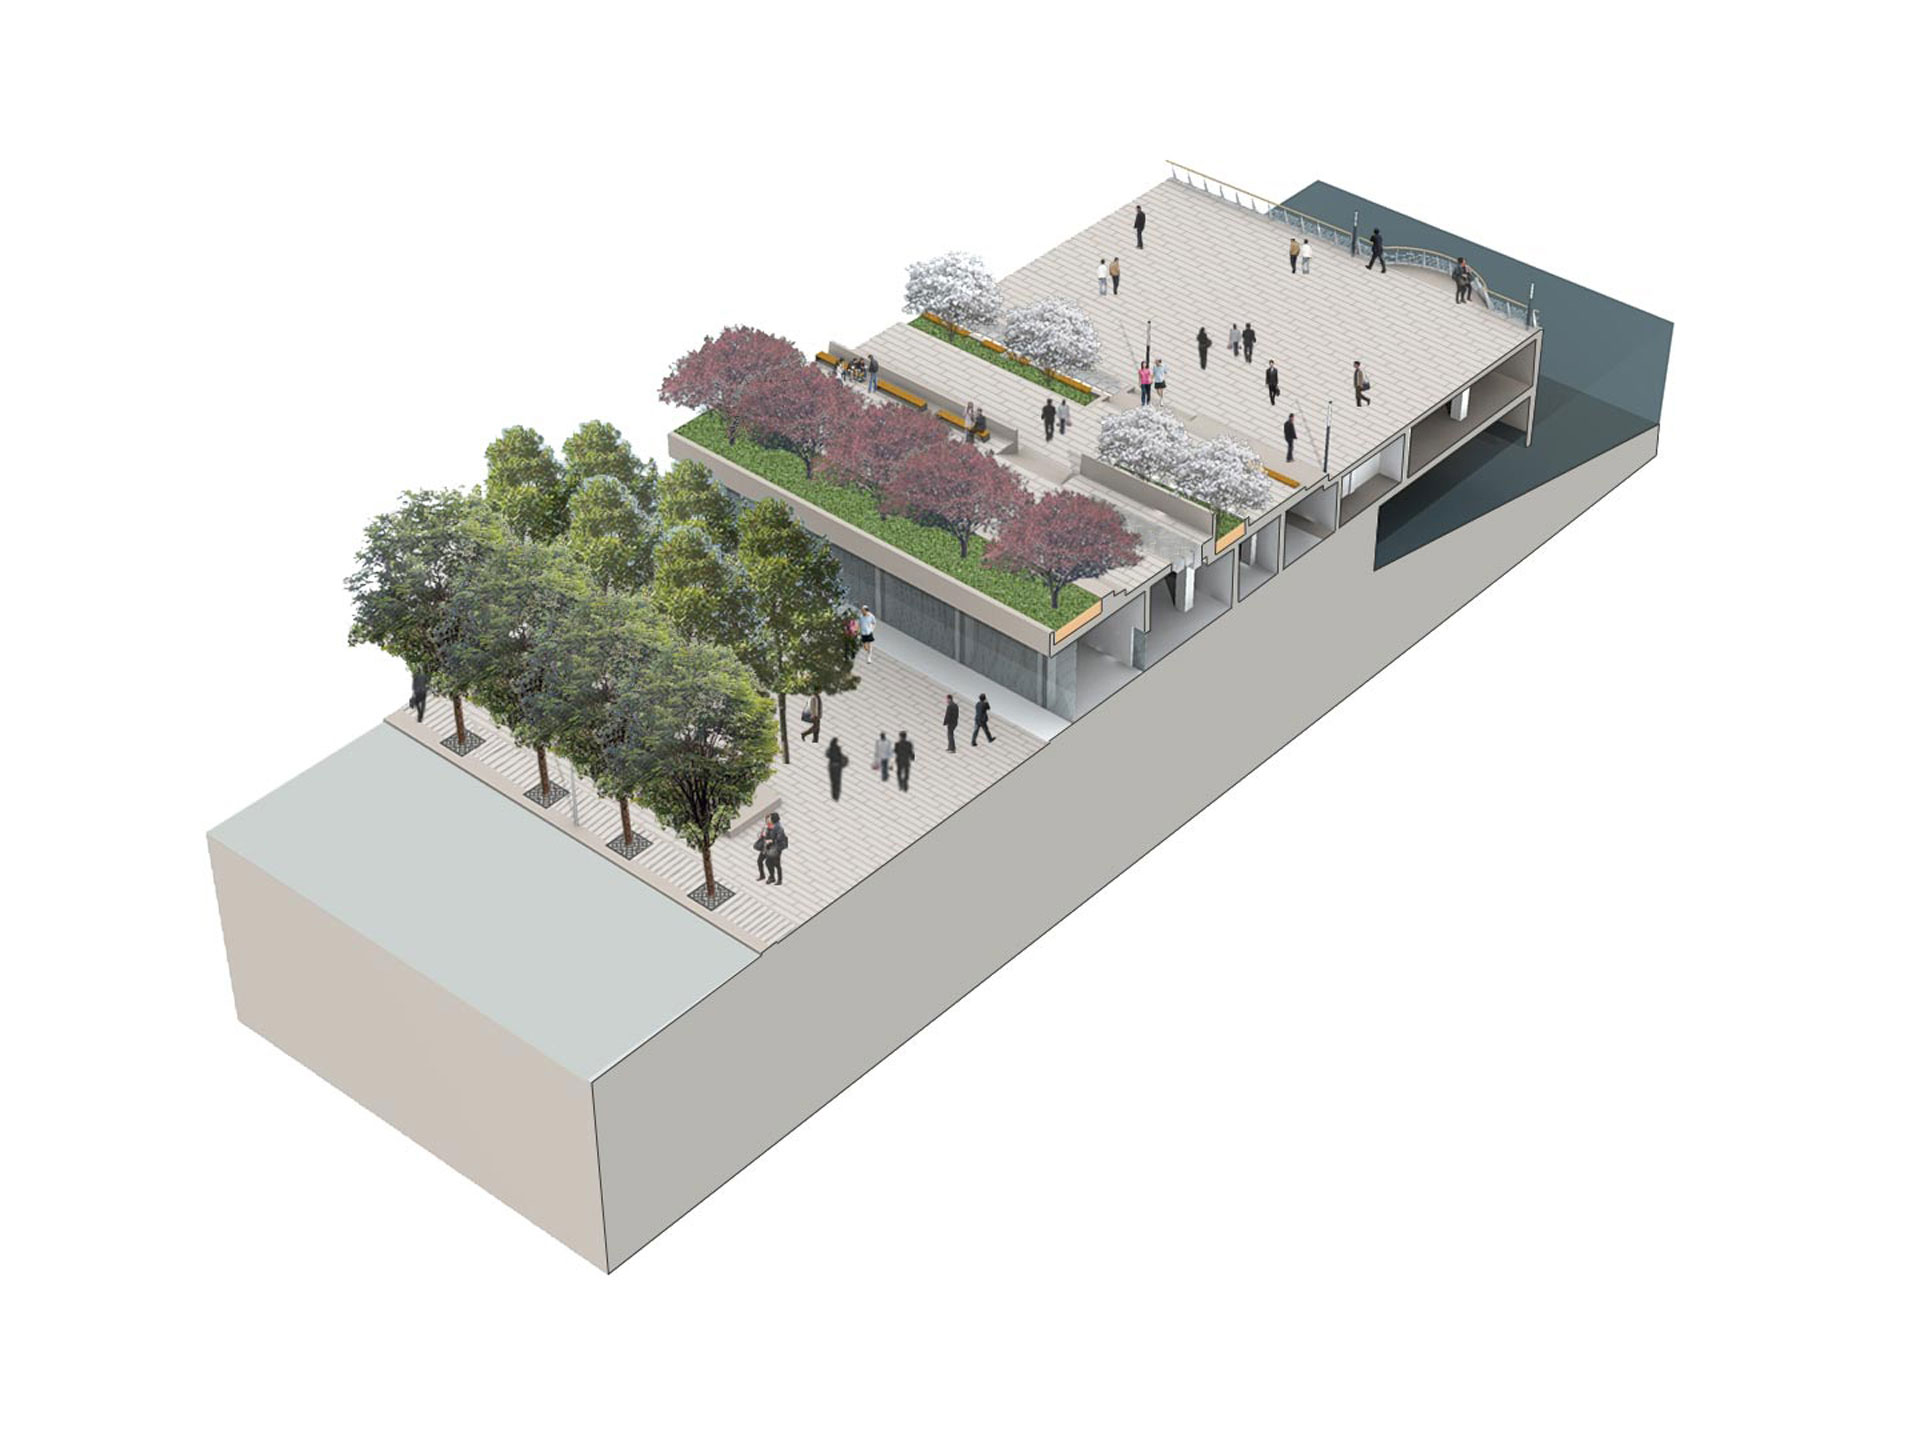 7_Shanghai-Bund_Klopfer-Martin-Design-Group_axonemetric_rendering_riverfront-promenade_urban-park.jpg